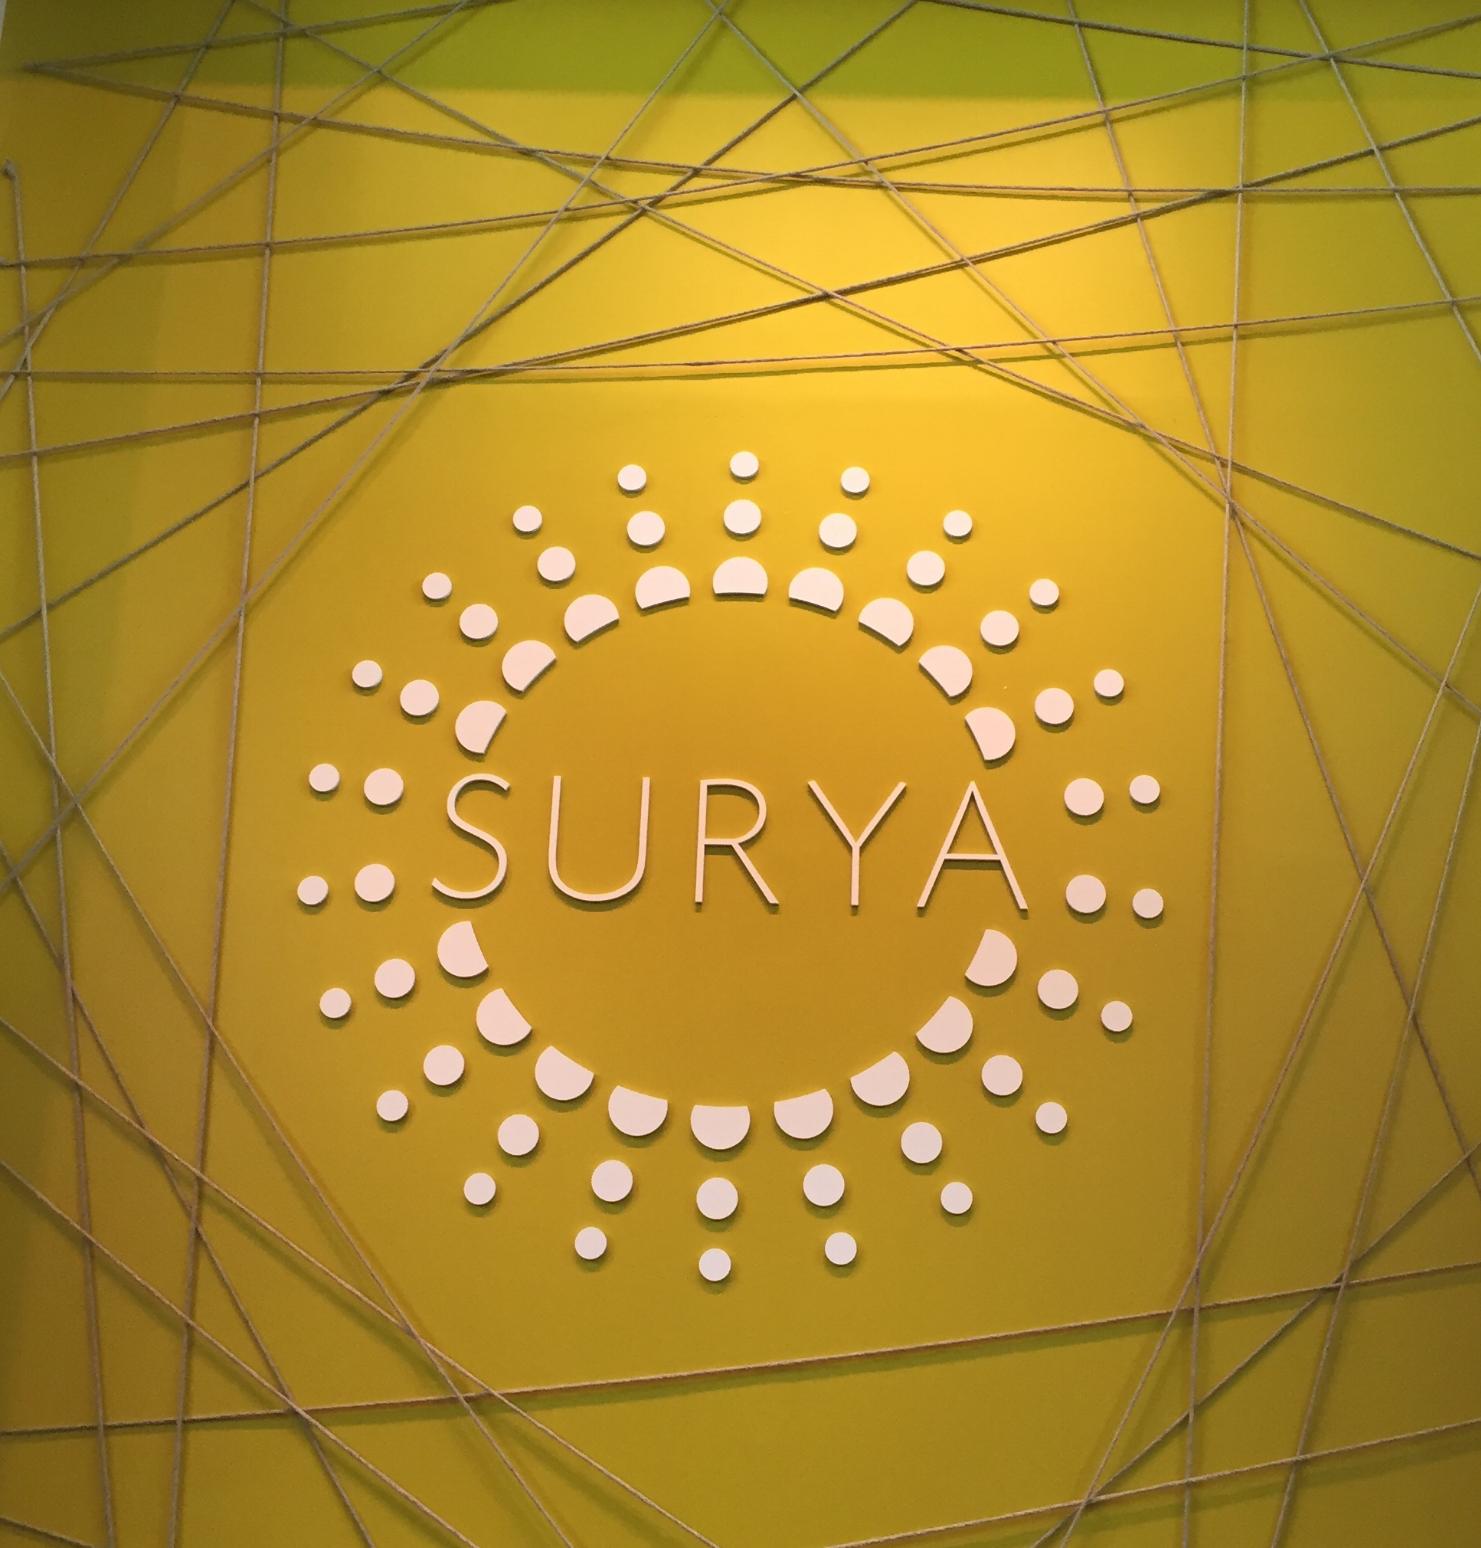 Surya HighPoint-Langford.JPG